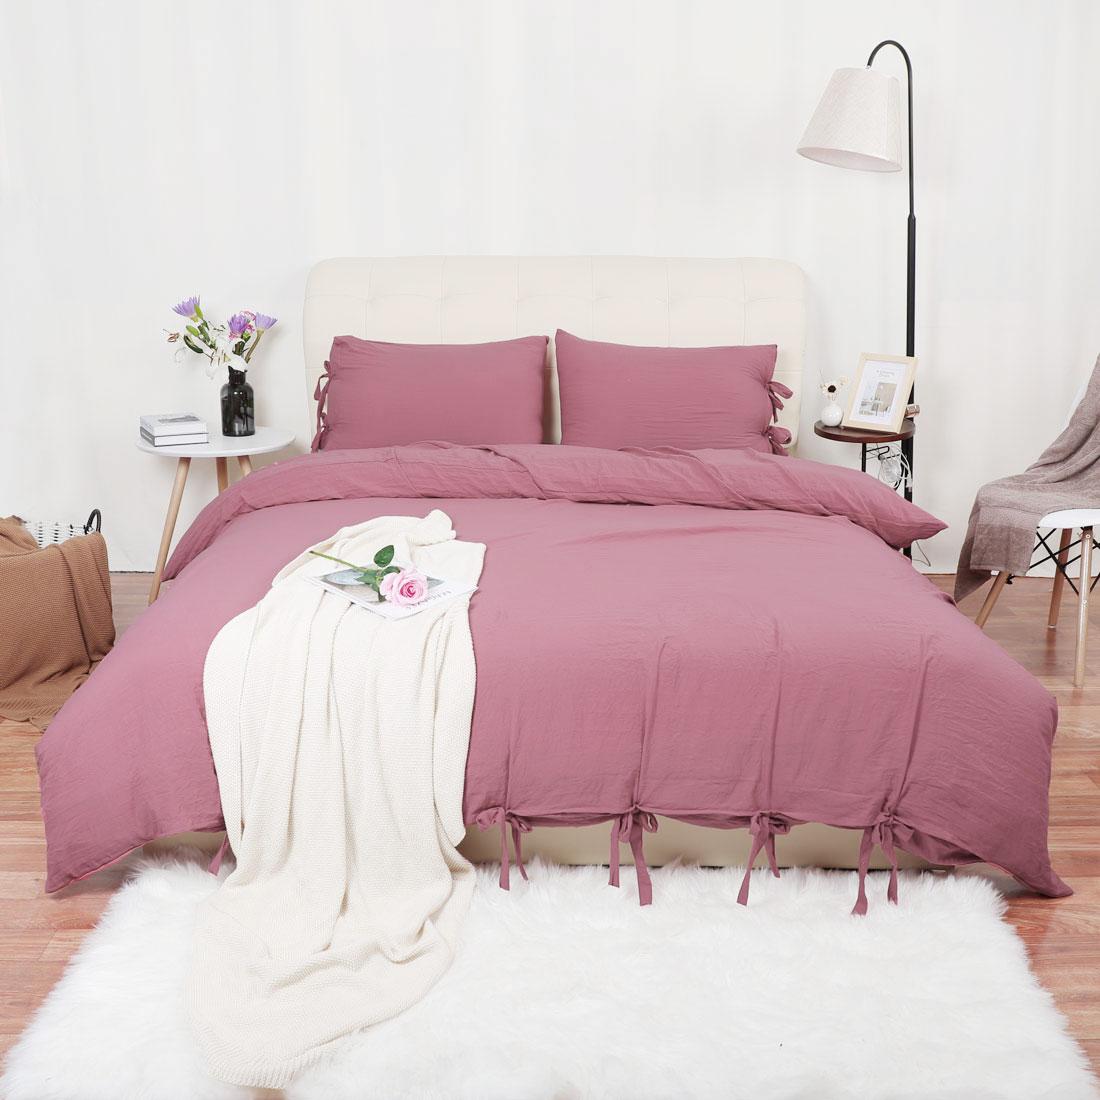 Washed-Cotton-Bedding-Set-Comforter-Duvet-Cover-Pillowcase-Bed-Sets-Solid-Color thumbnail 20